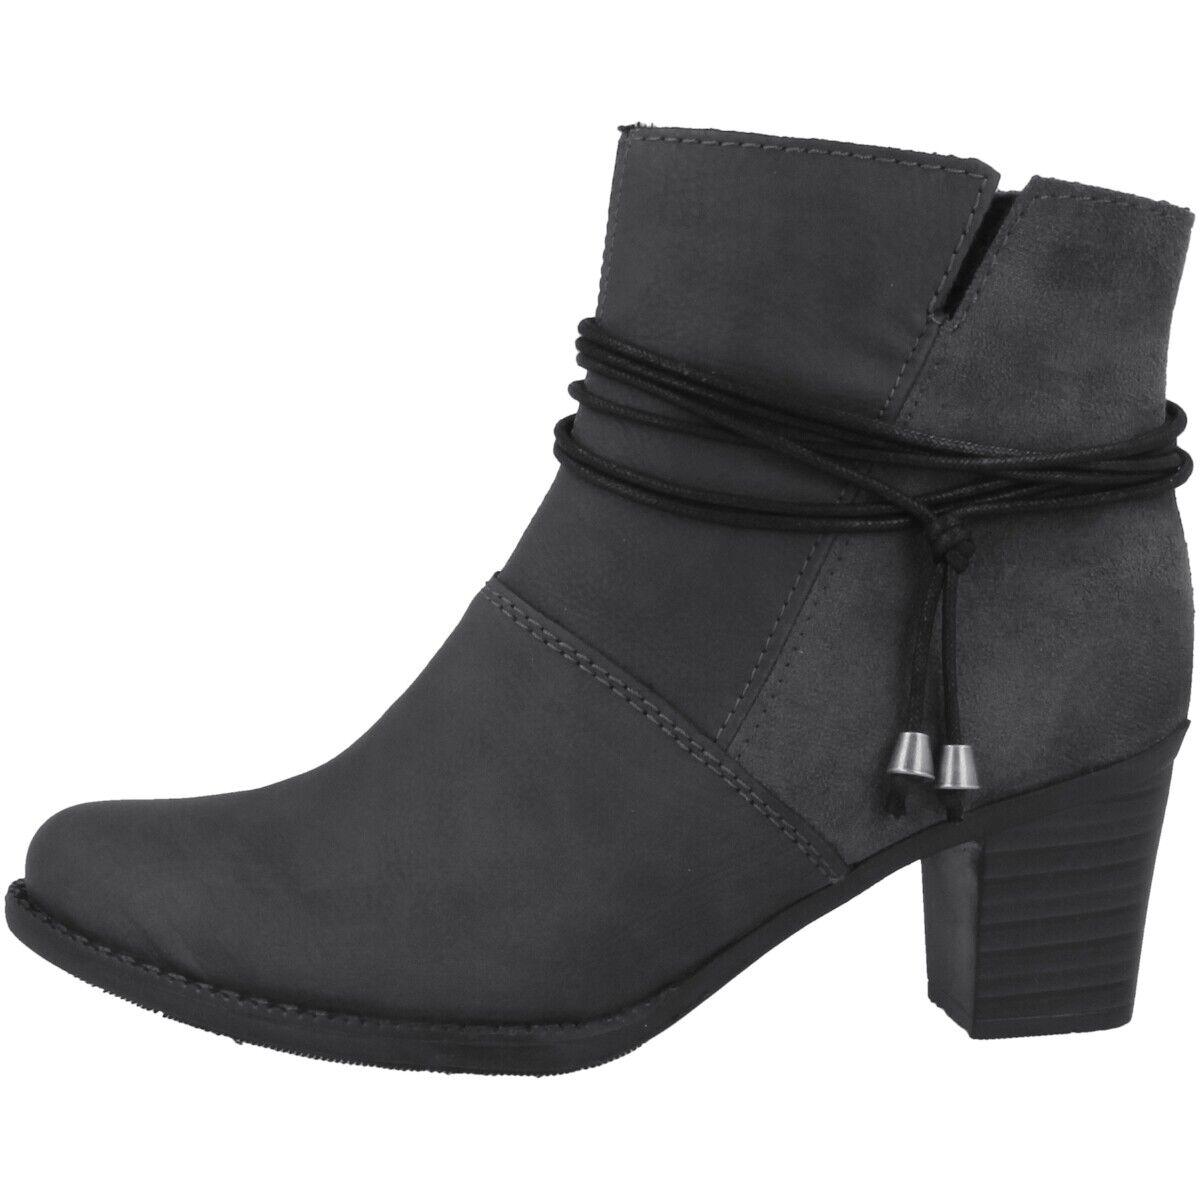 Rieker Namur-Microvelour Schuhe Damen Antistress Stiefeletten grau lead Z7656-45